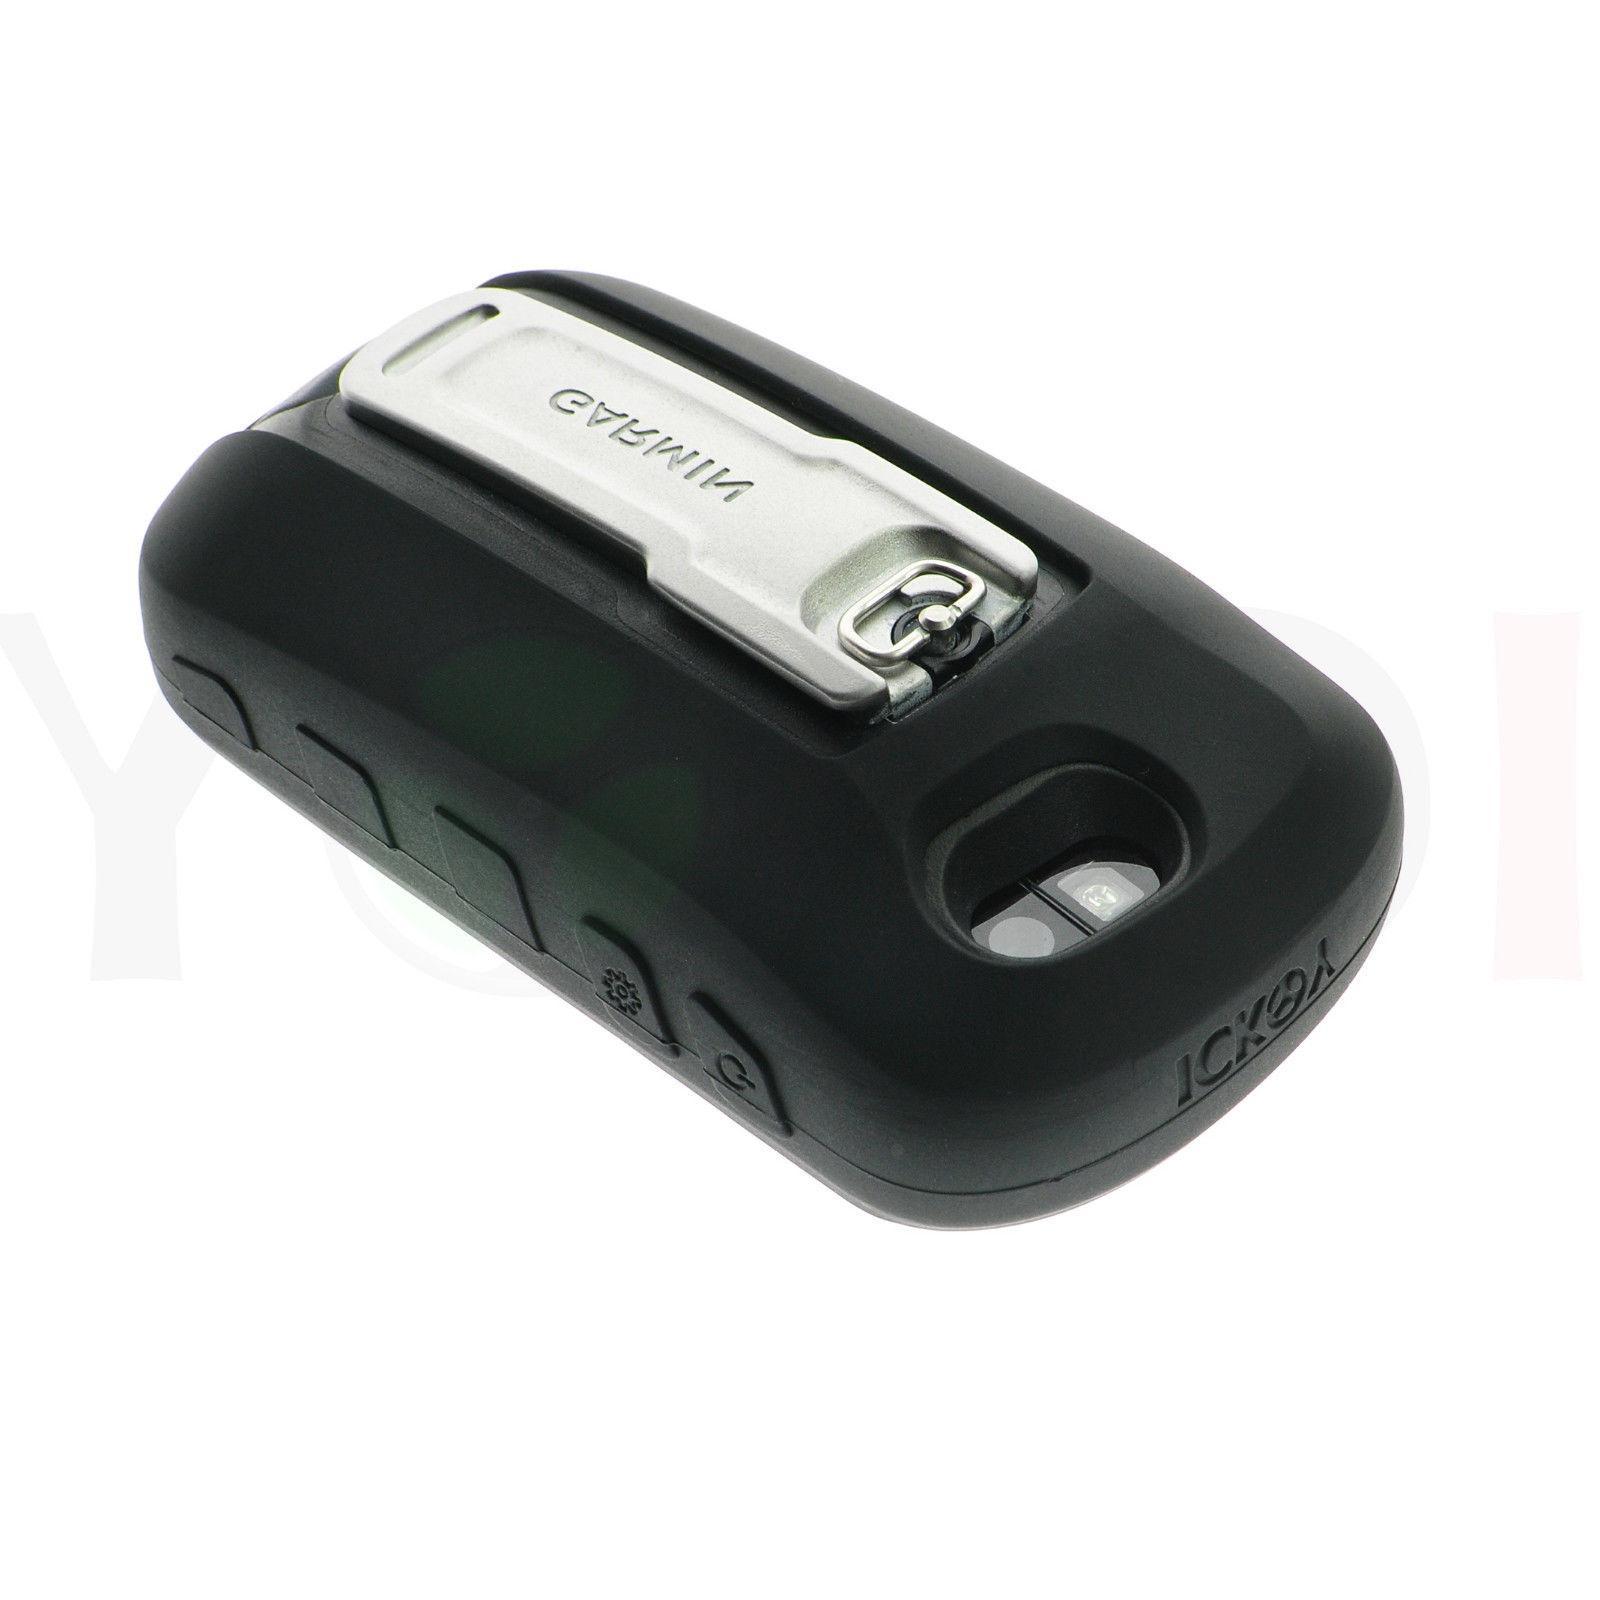 Protect Handheld Oregon 750